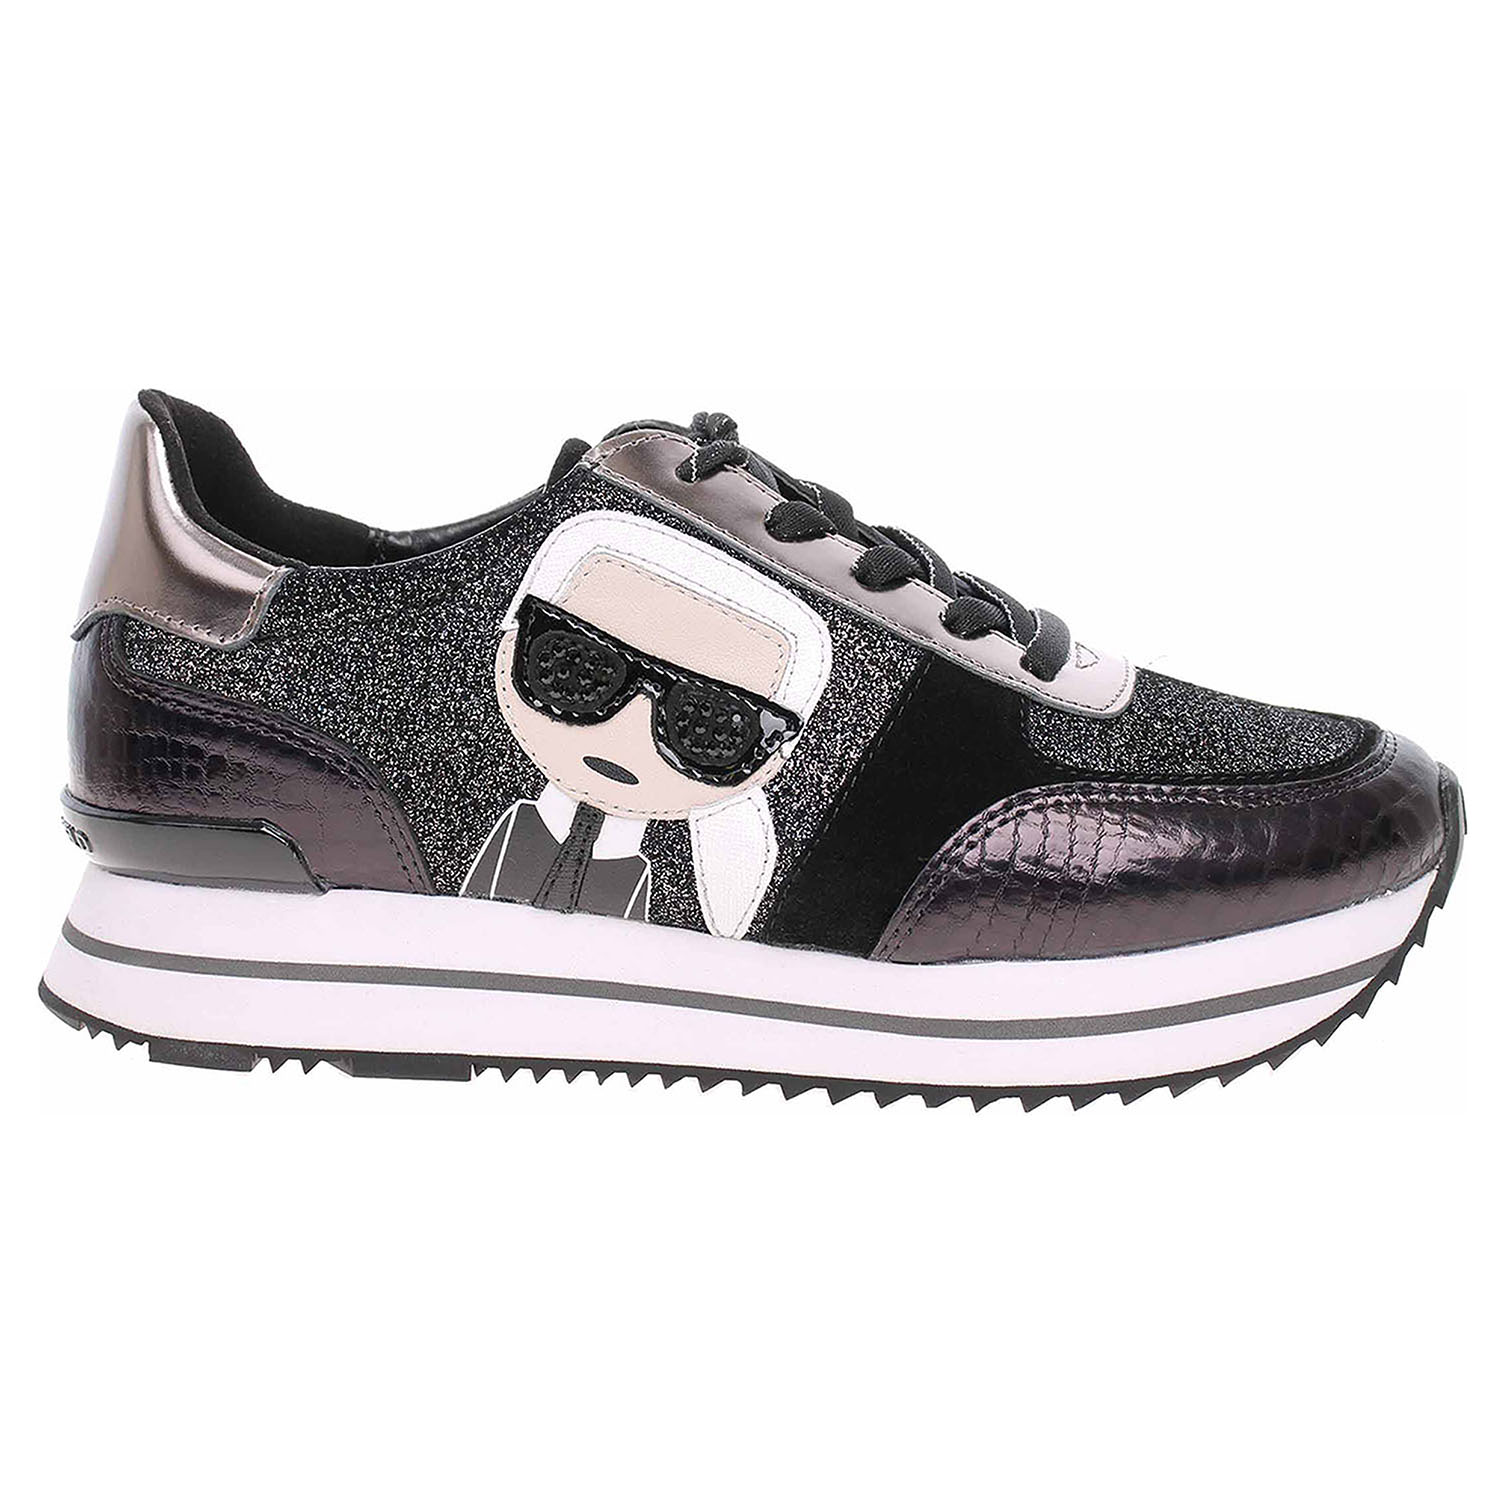 Dámská obuv Karl Lagerfeld KL61932 G0L black glitter-silver KL61932 G0L 39